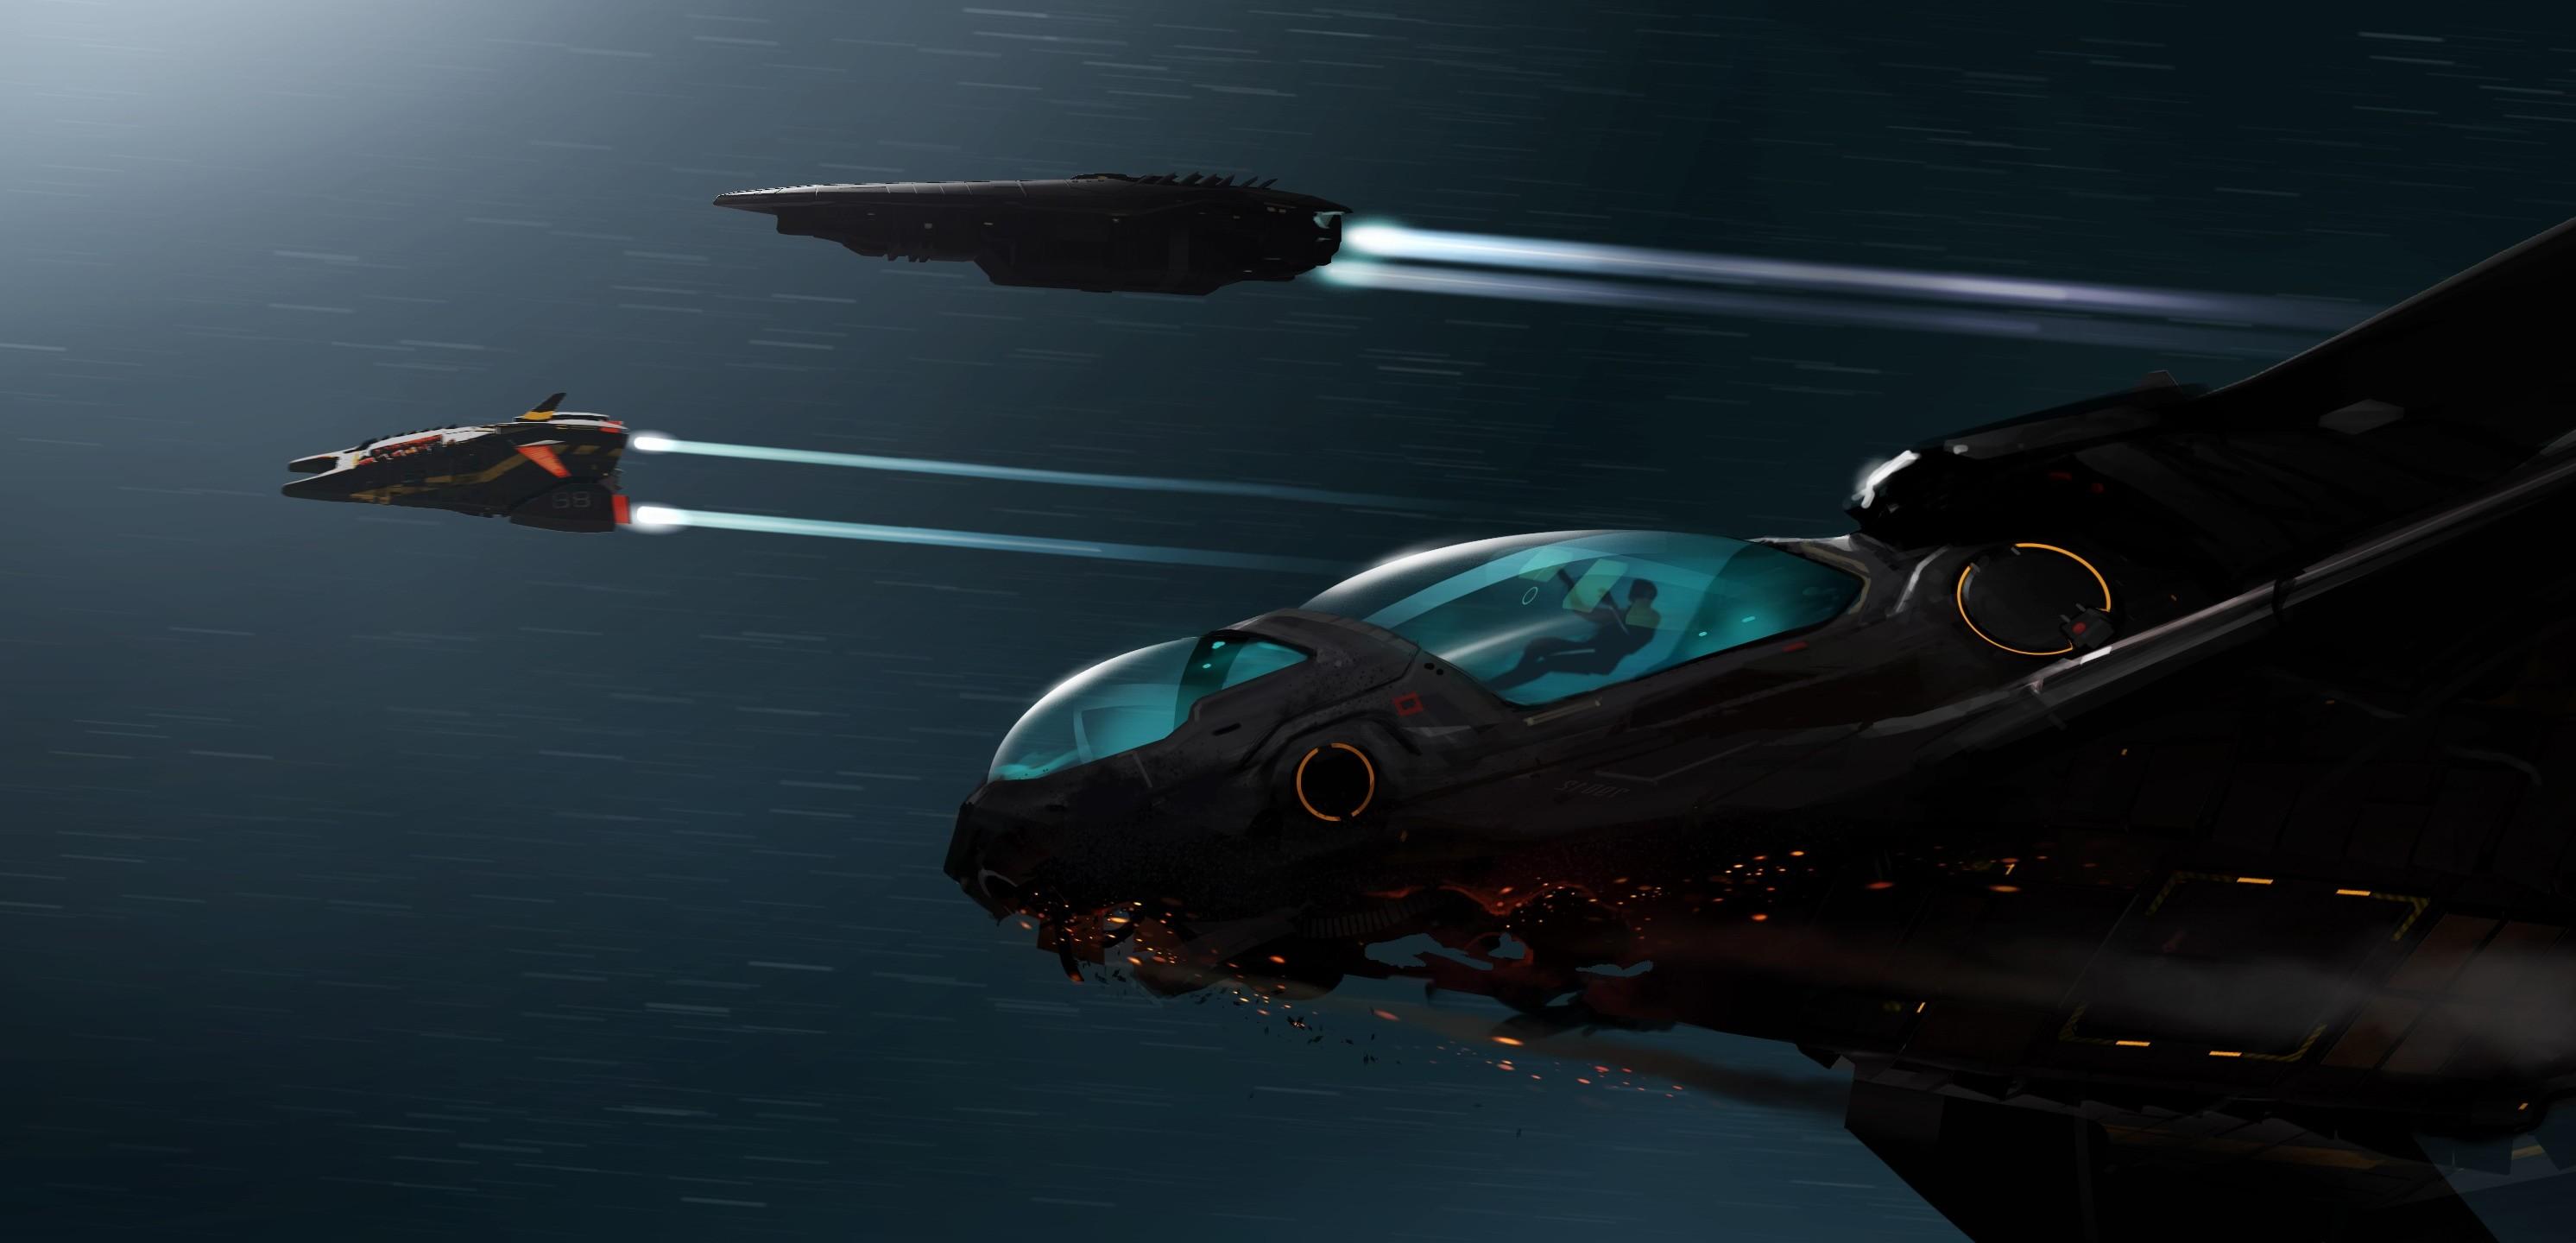 Elite Dangerous Spaceships Wallpapers HD / Desktop and Mobile Backgrounds